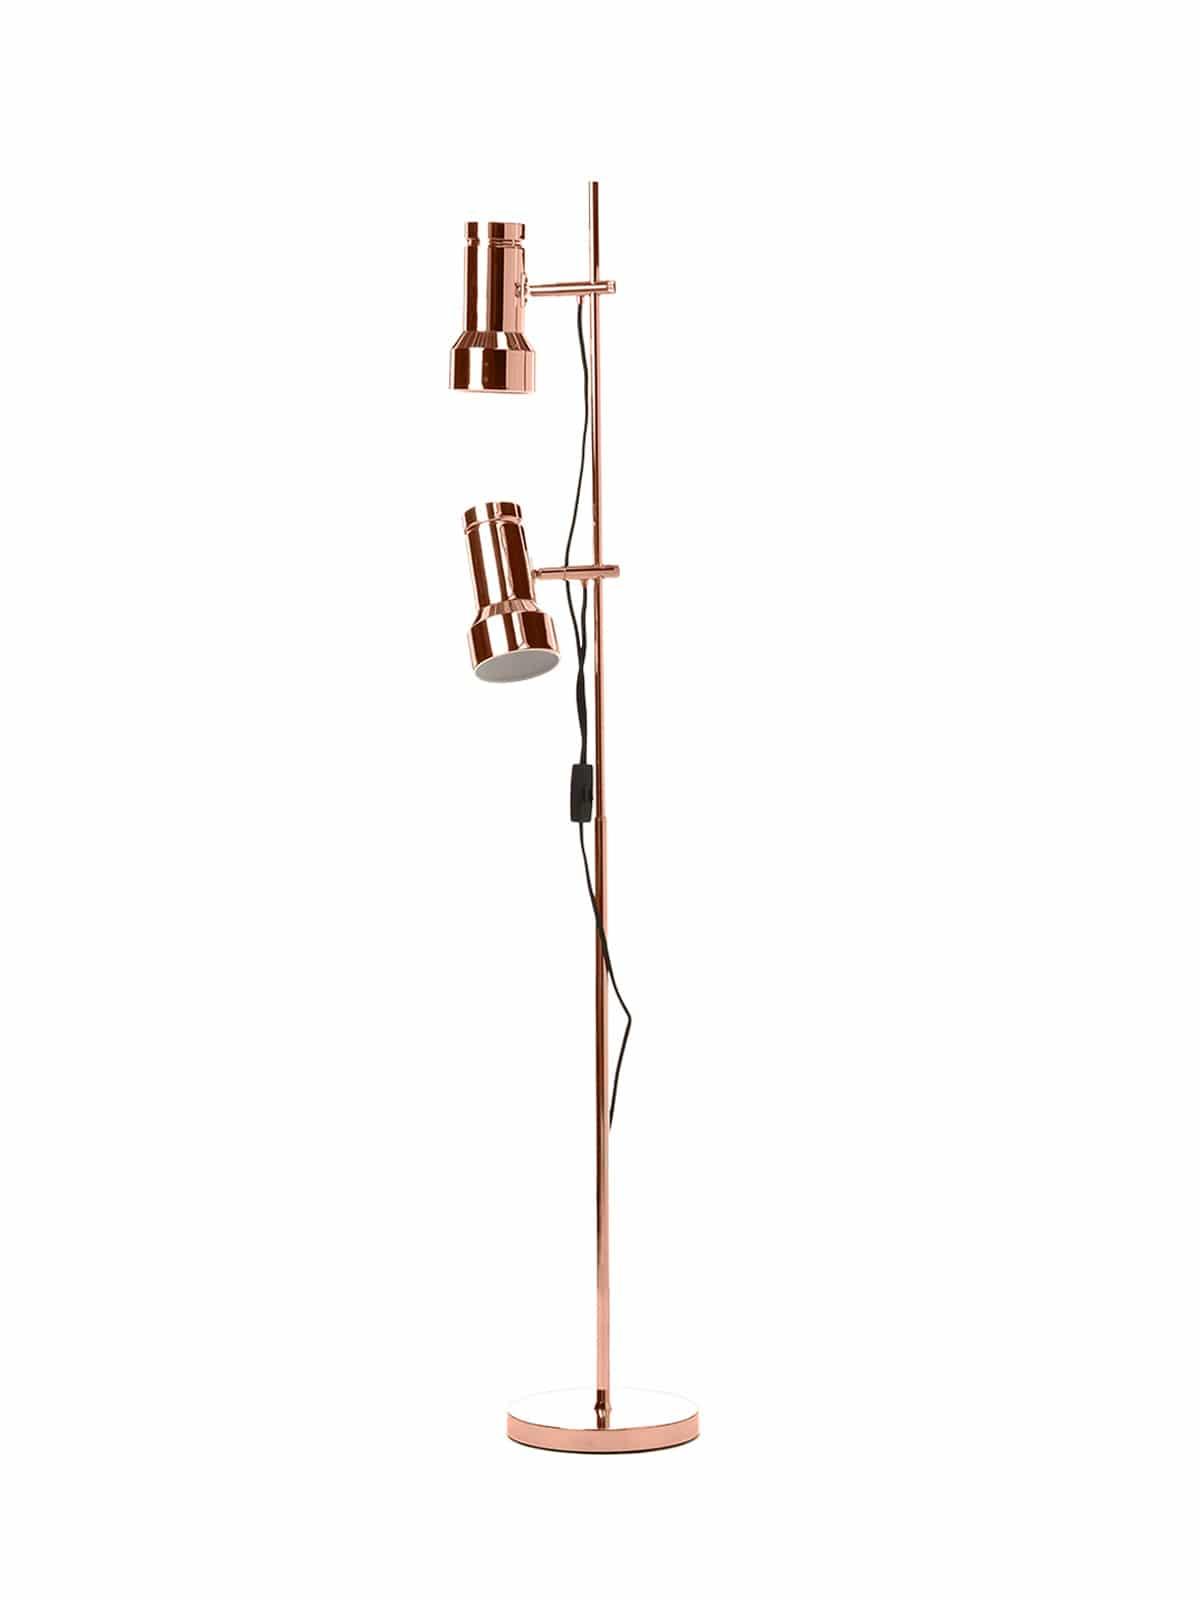 Klassik Stehlampe von Frandsen in Messing